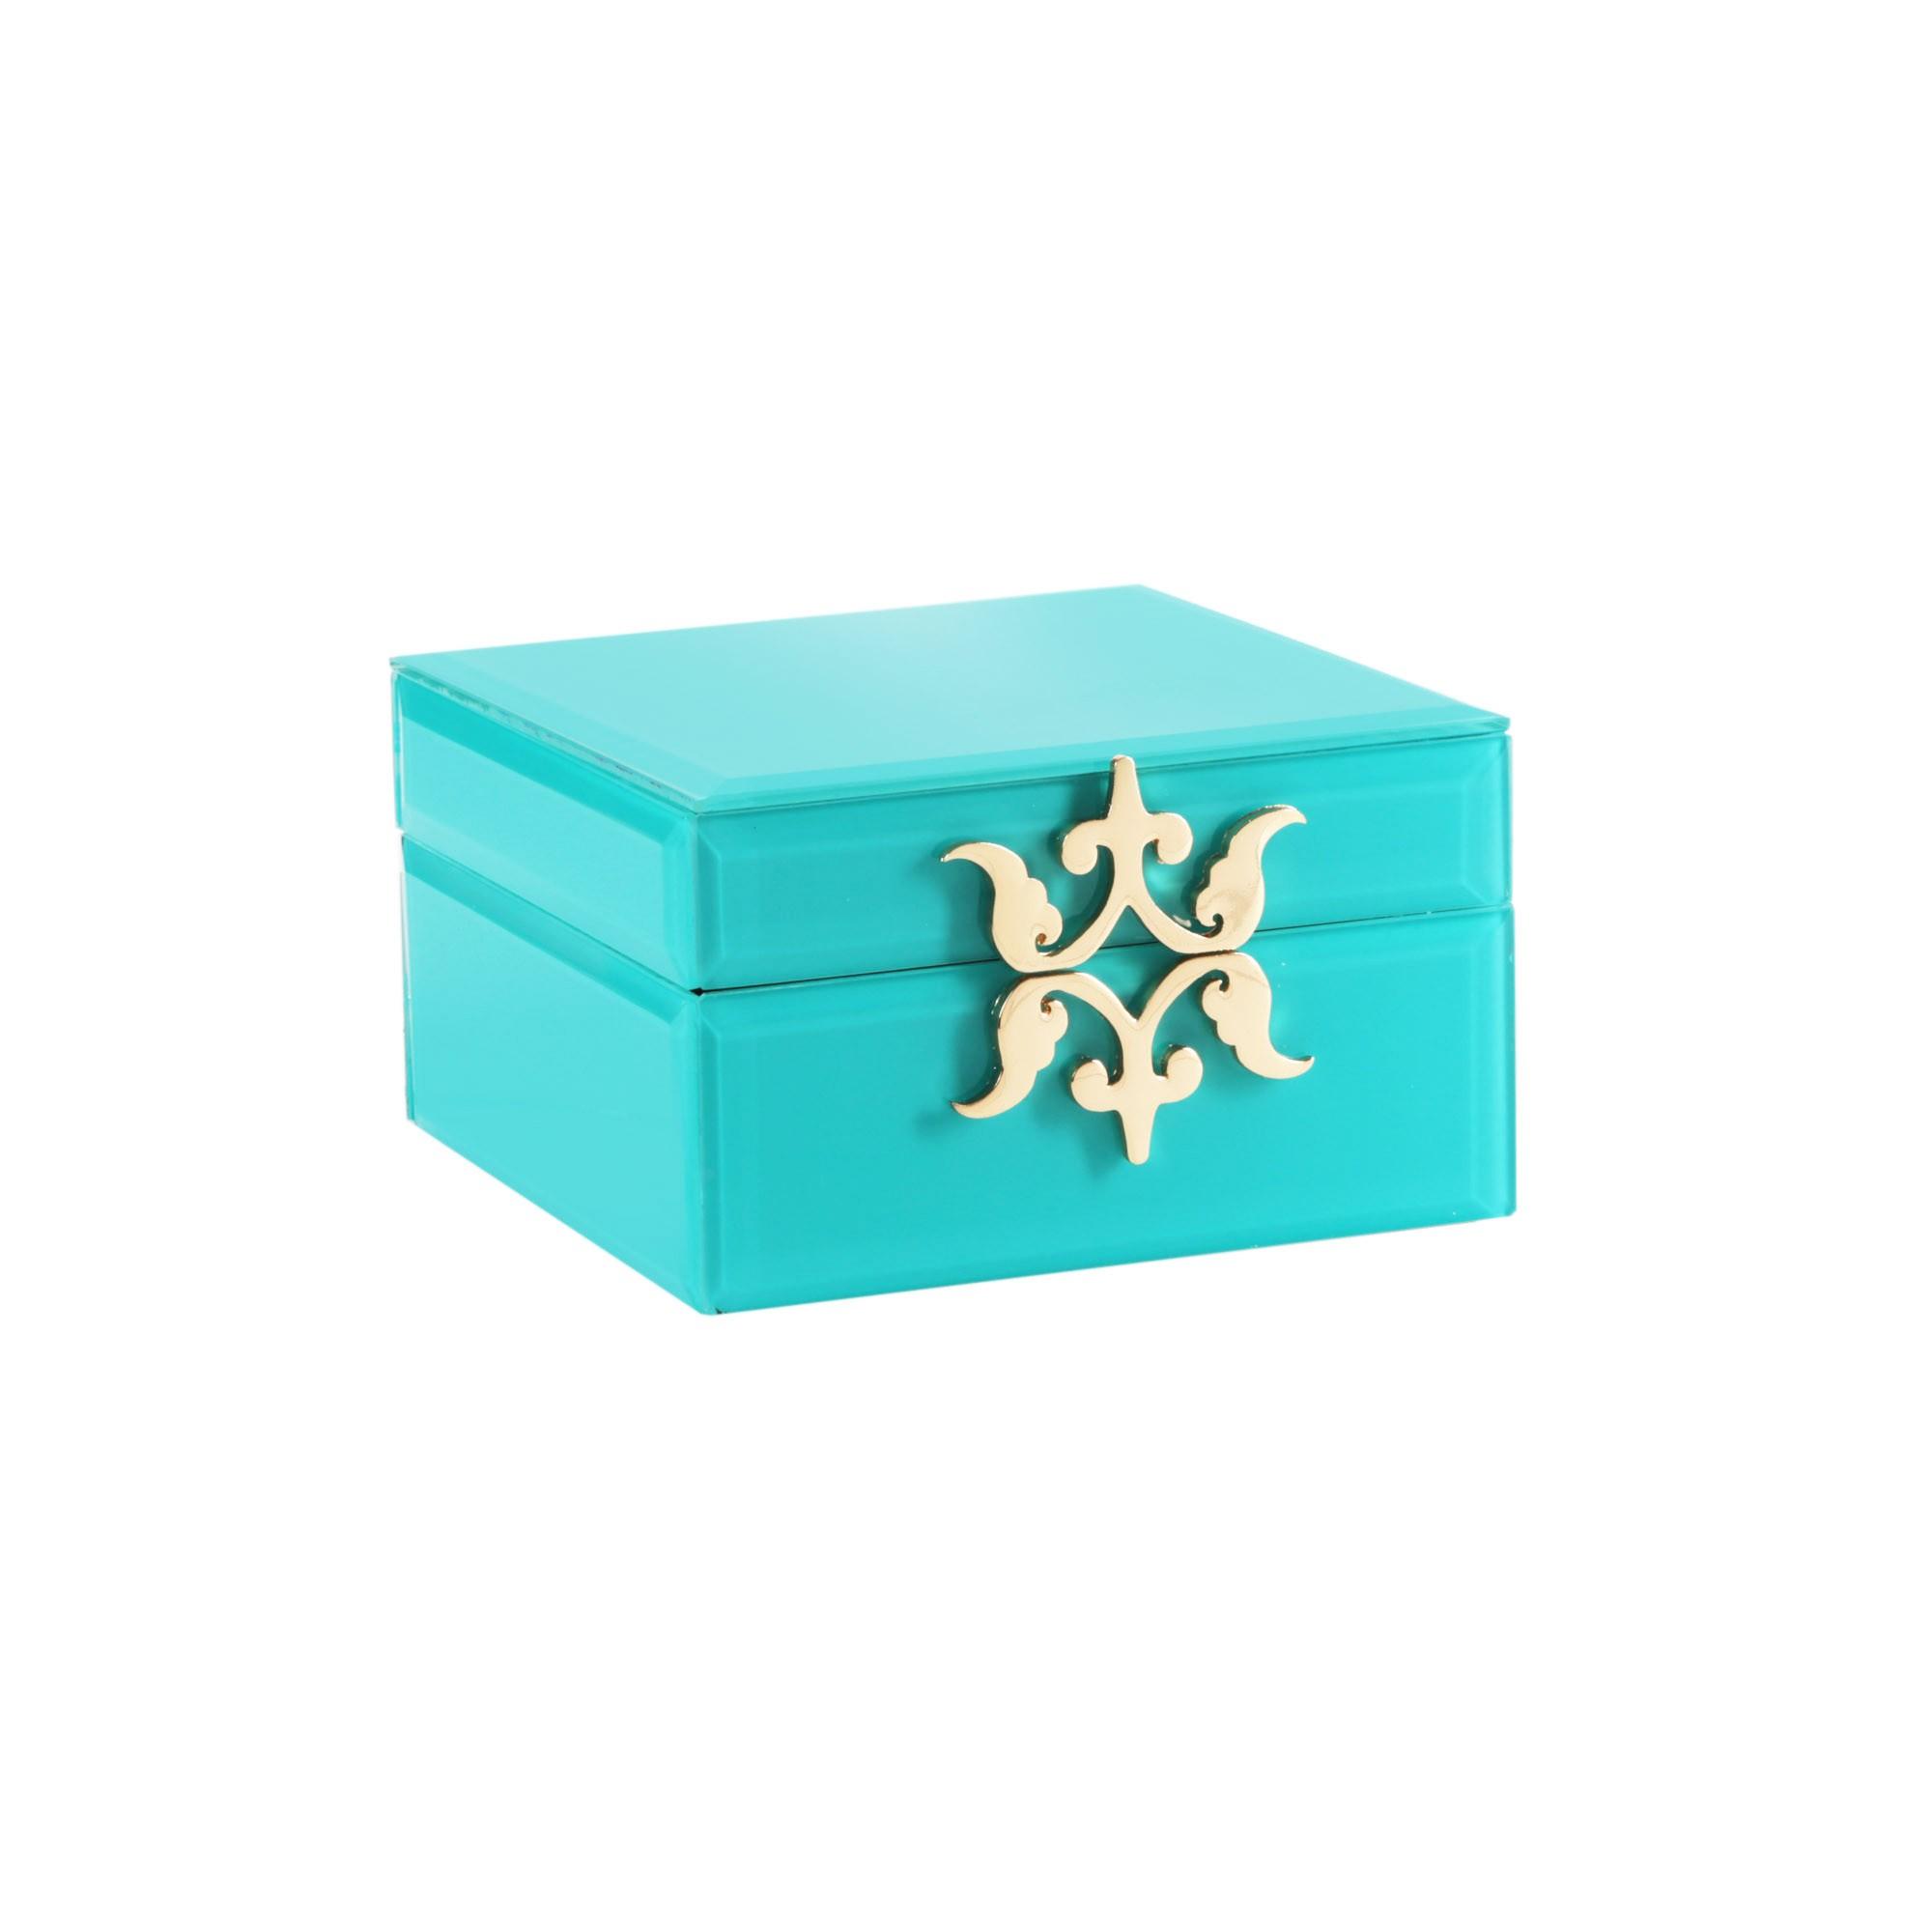 Tracy Porter Square Glass Jewelry Box